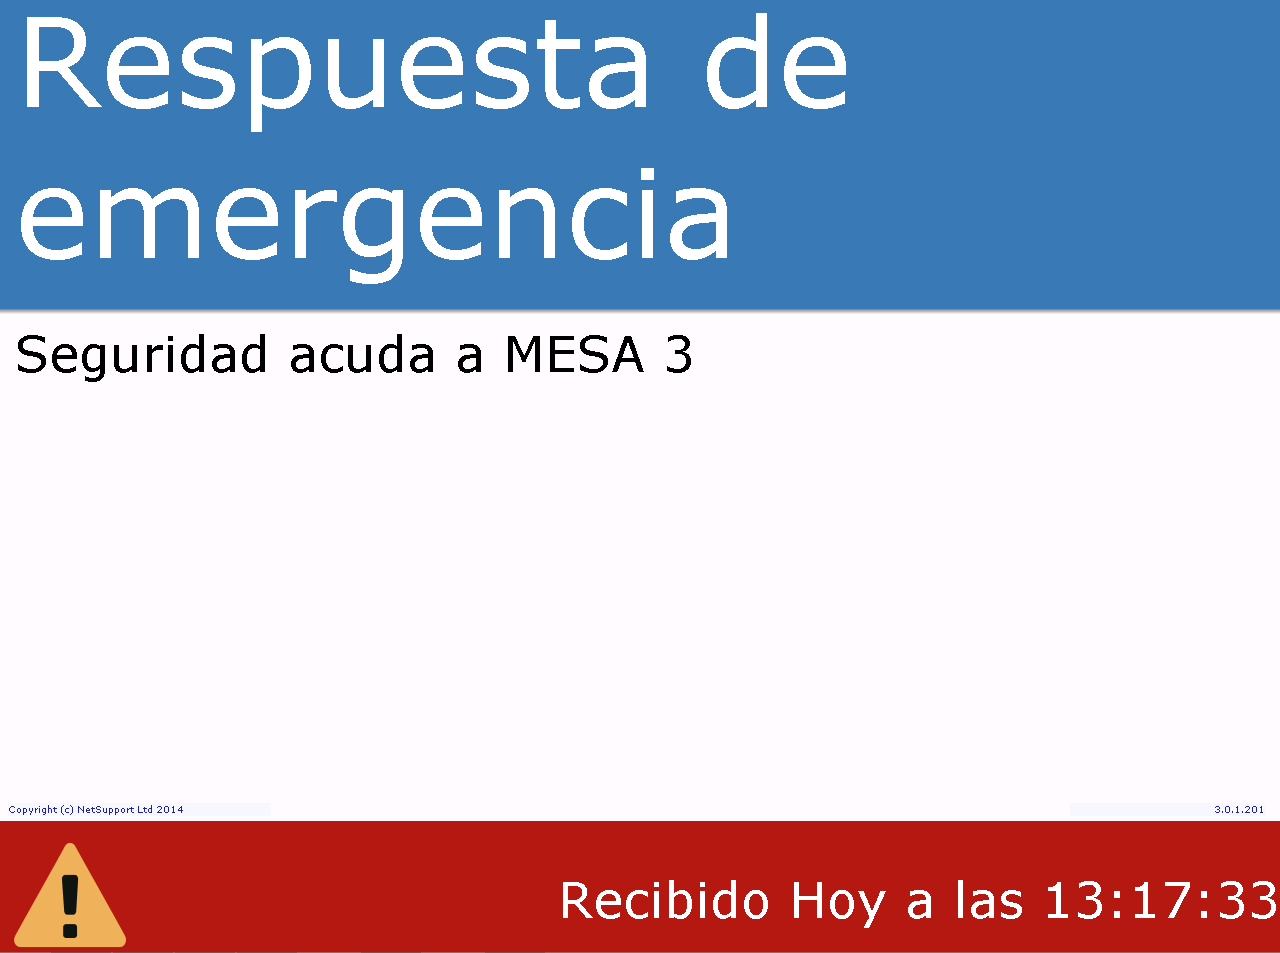 mensaje emergencia notify